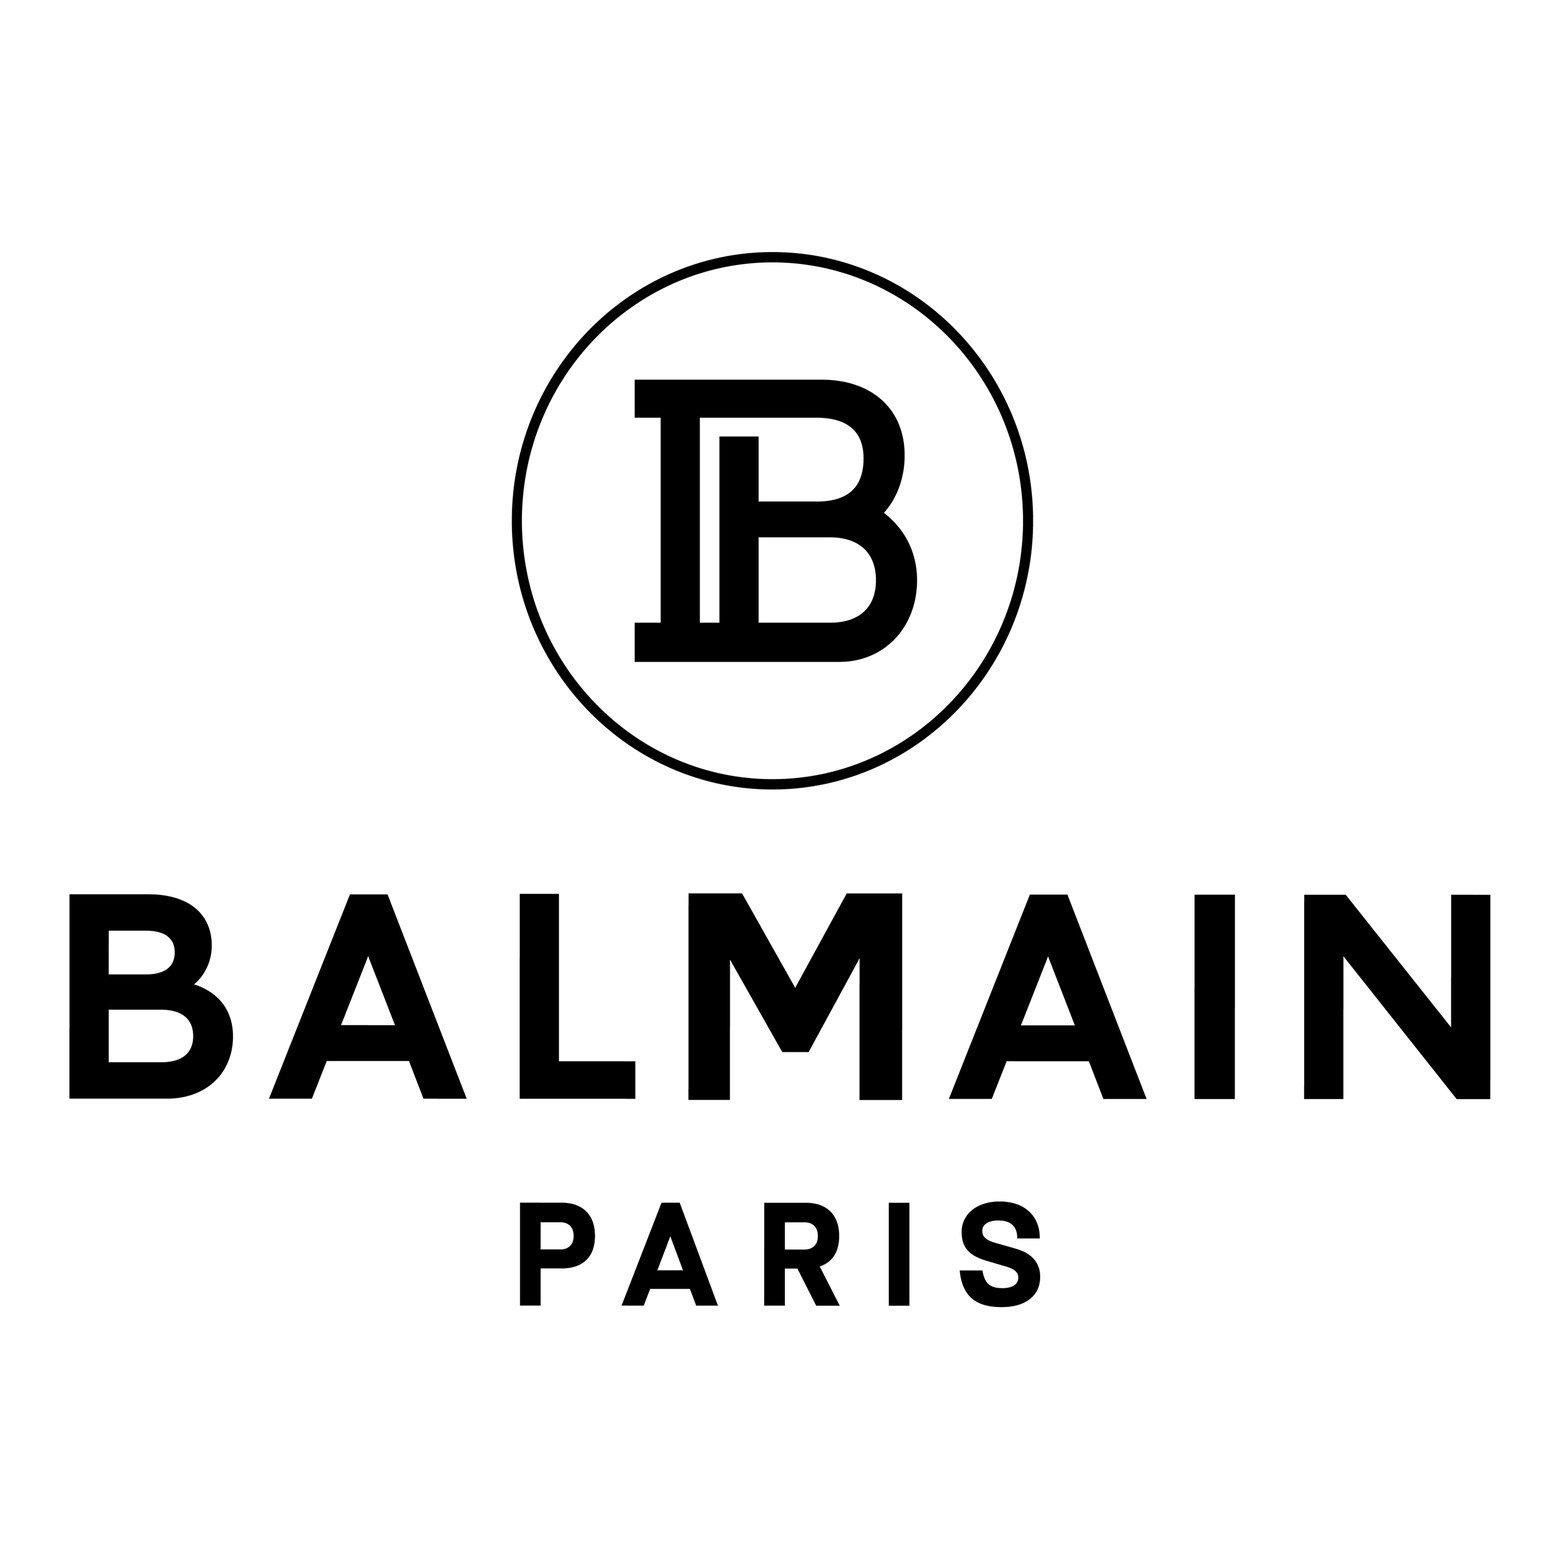 00-story-balmain-paris-logo-1